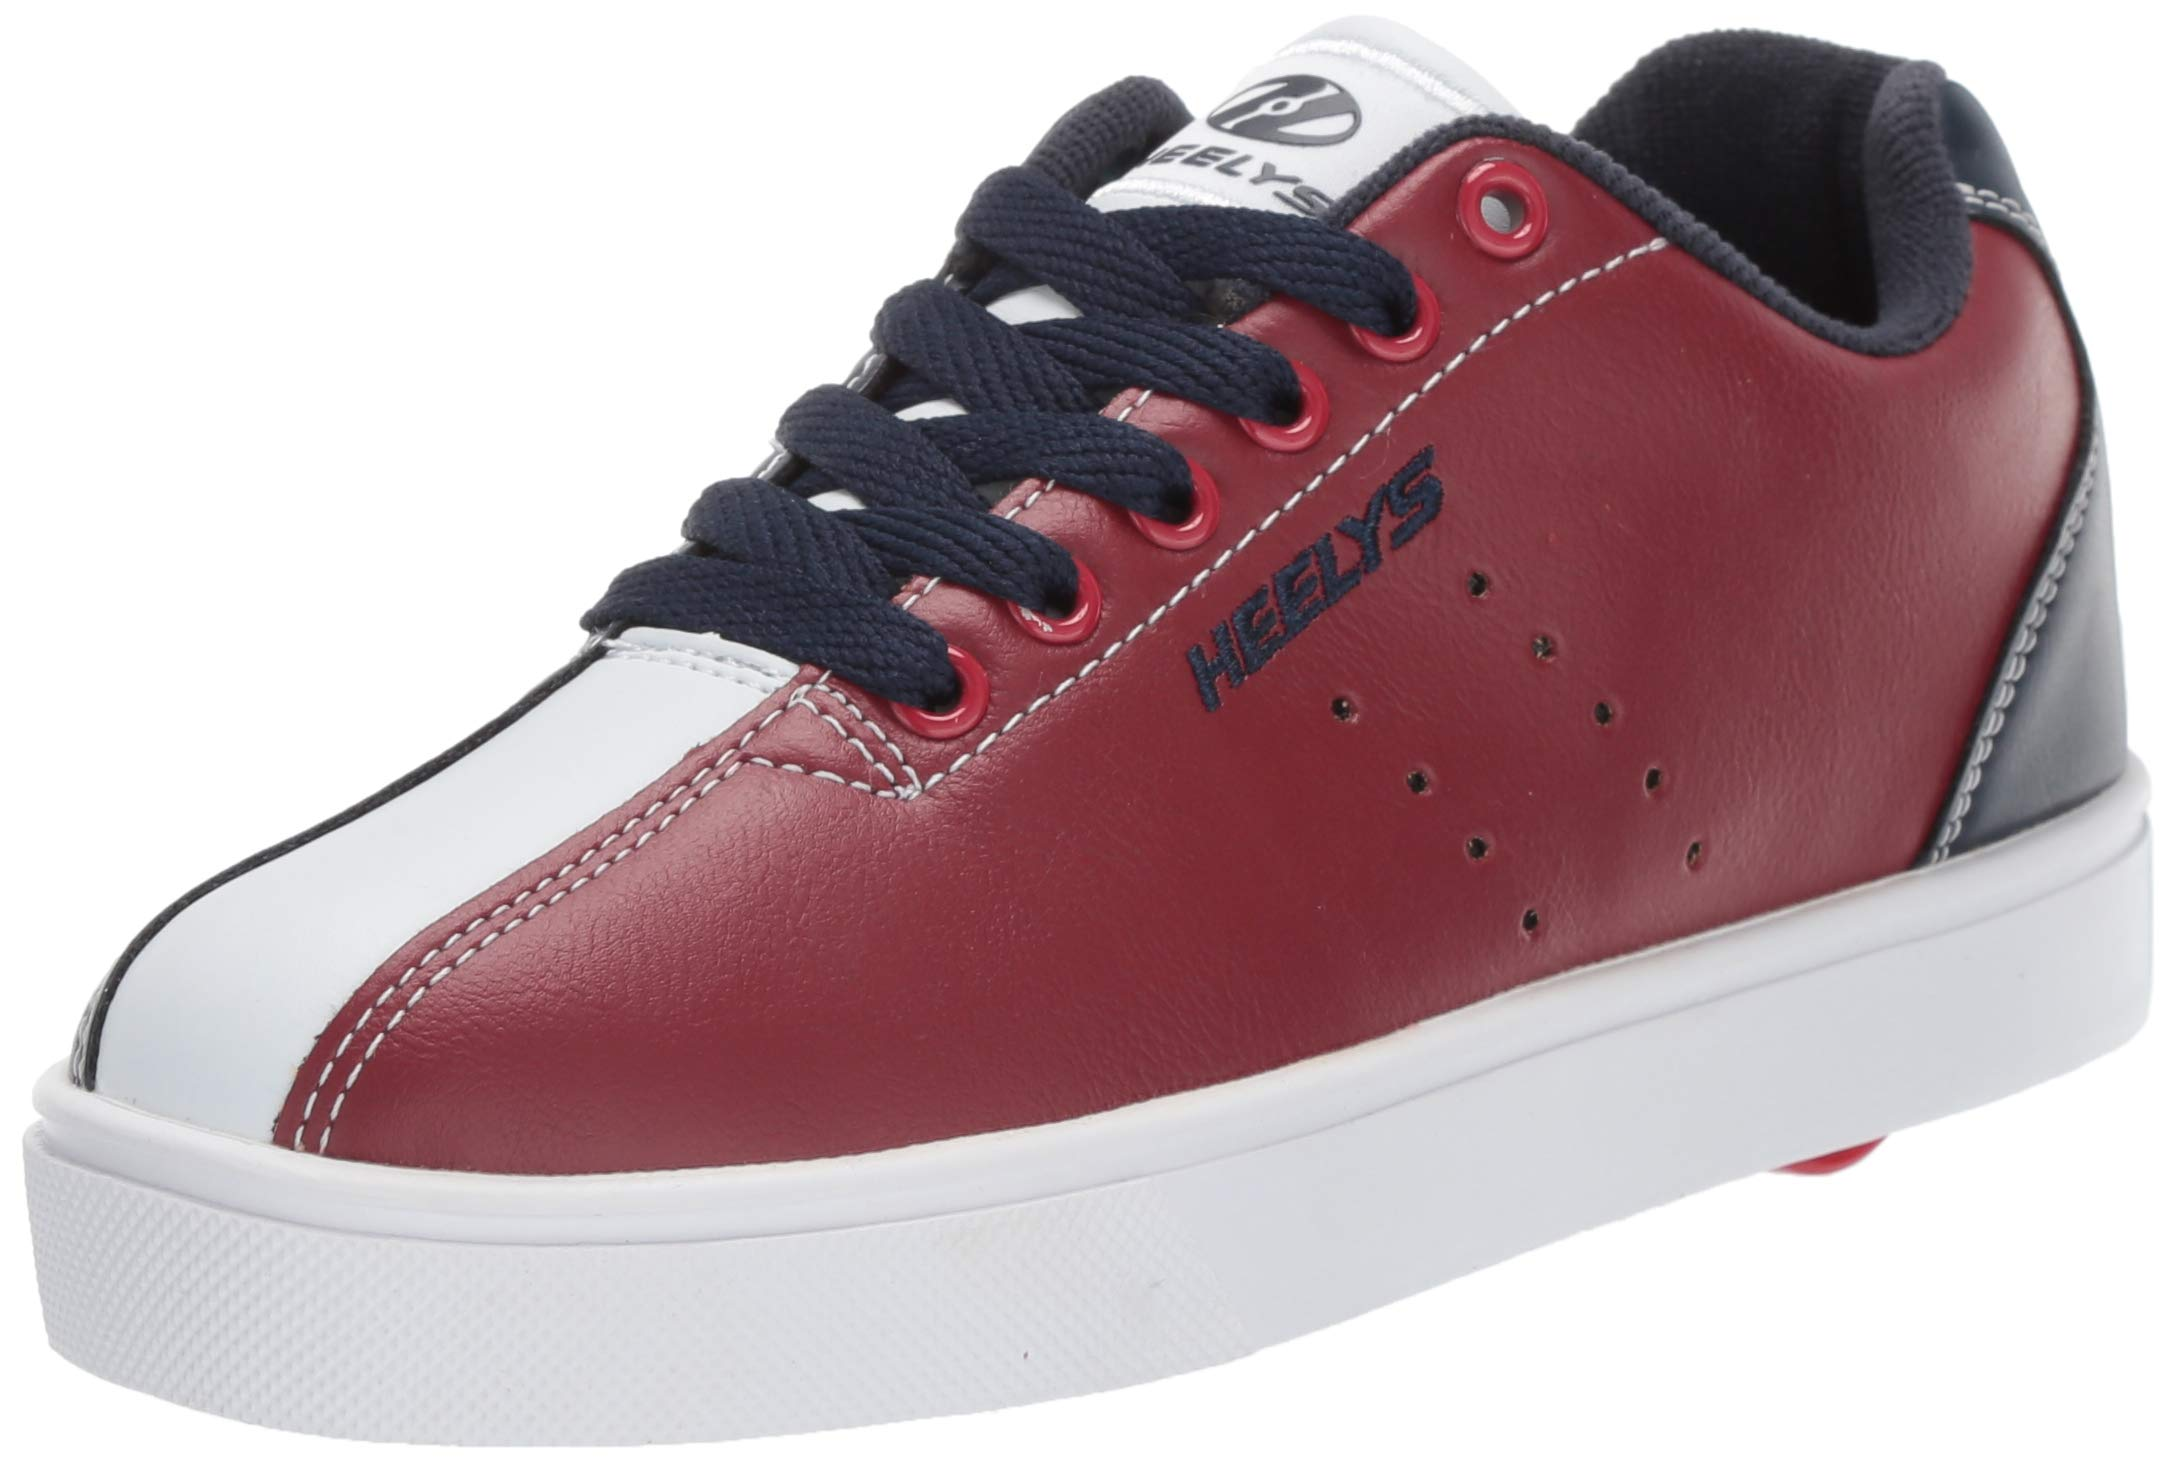 Heelys Boys' Alley Tennis Shoe, red/Navy/White, 1 M US Big Kid